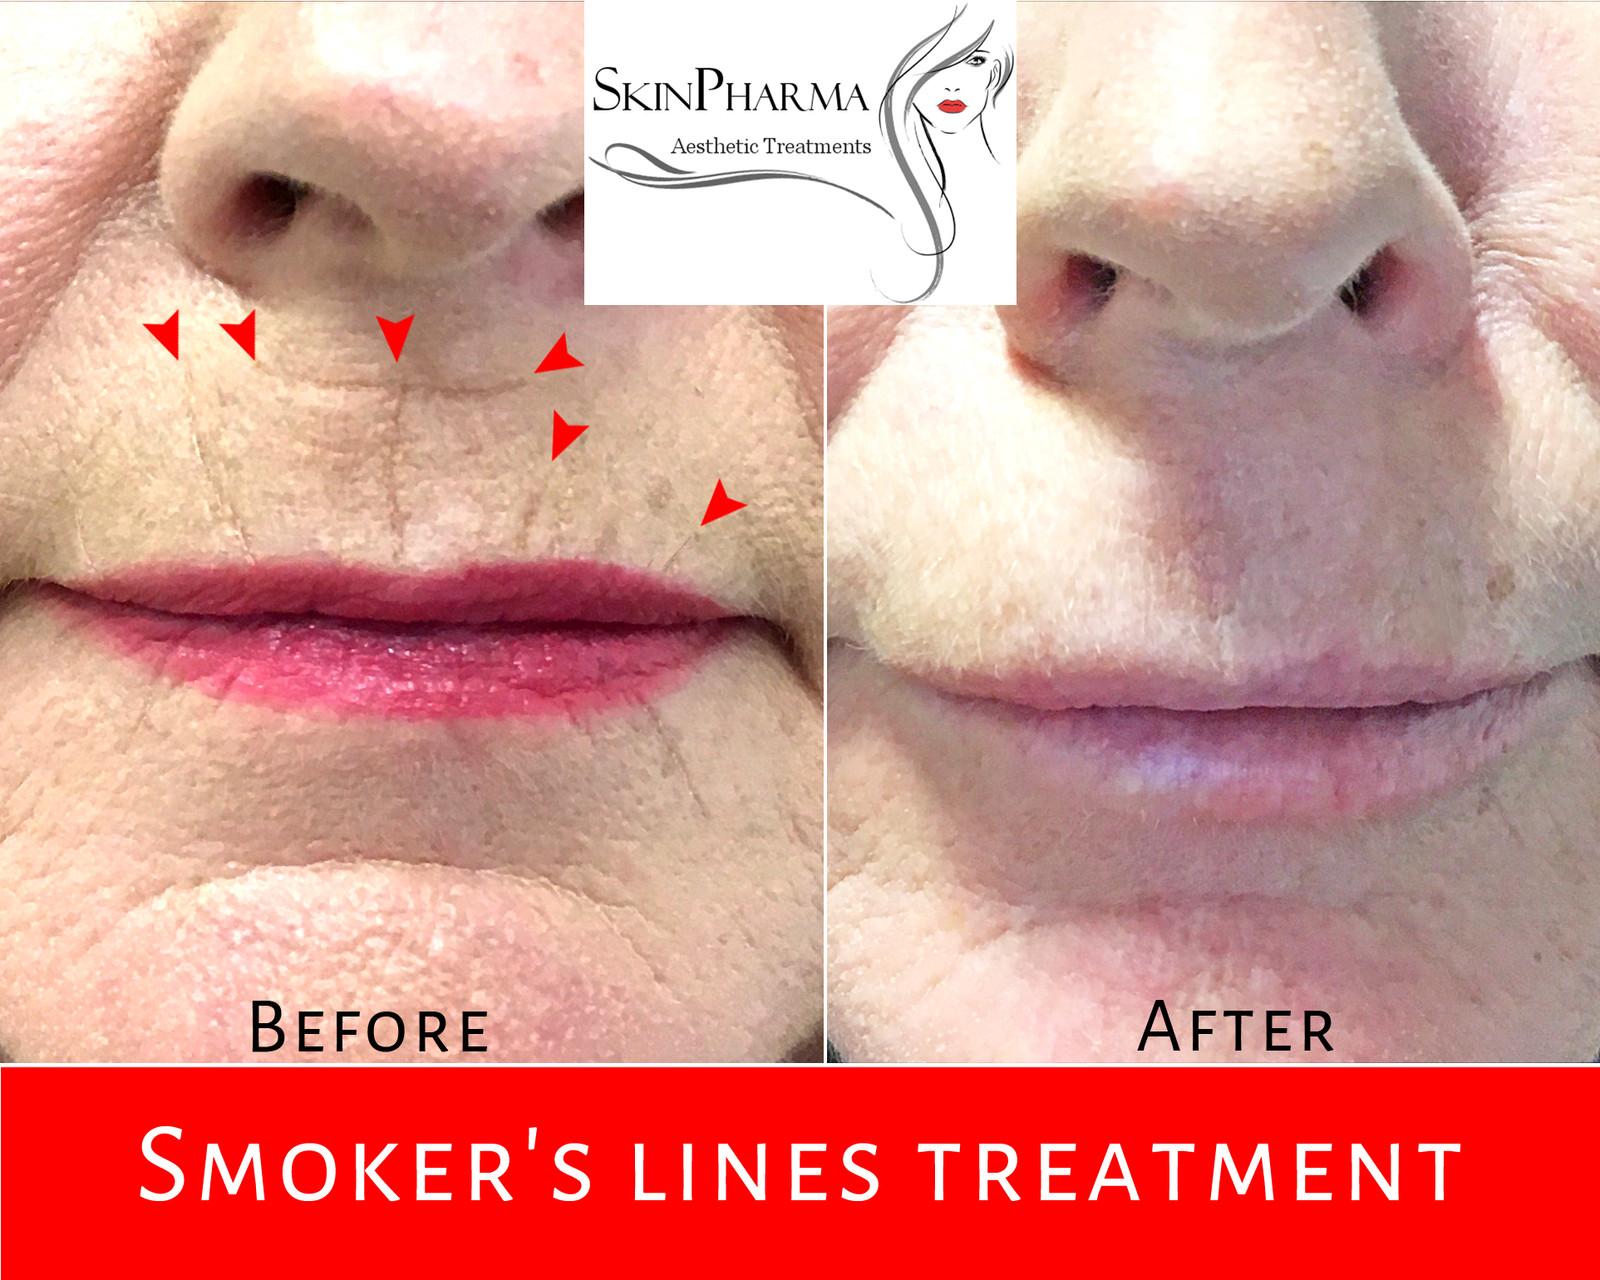 Smoker's lines treatment